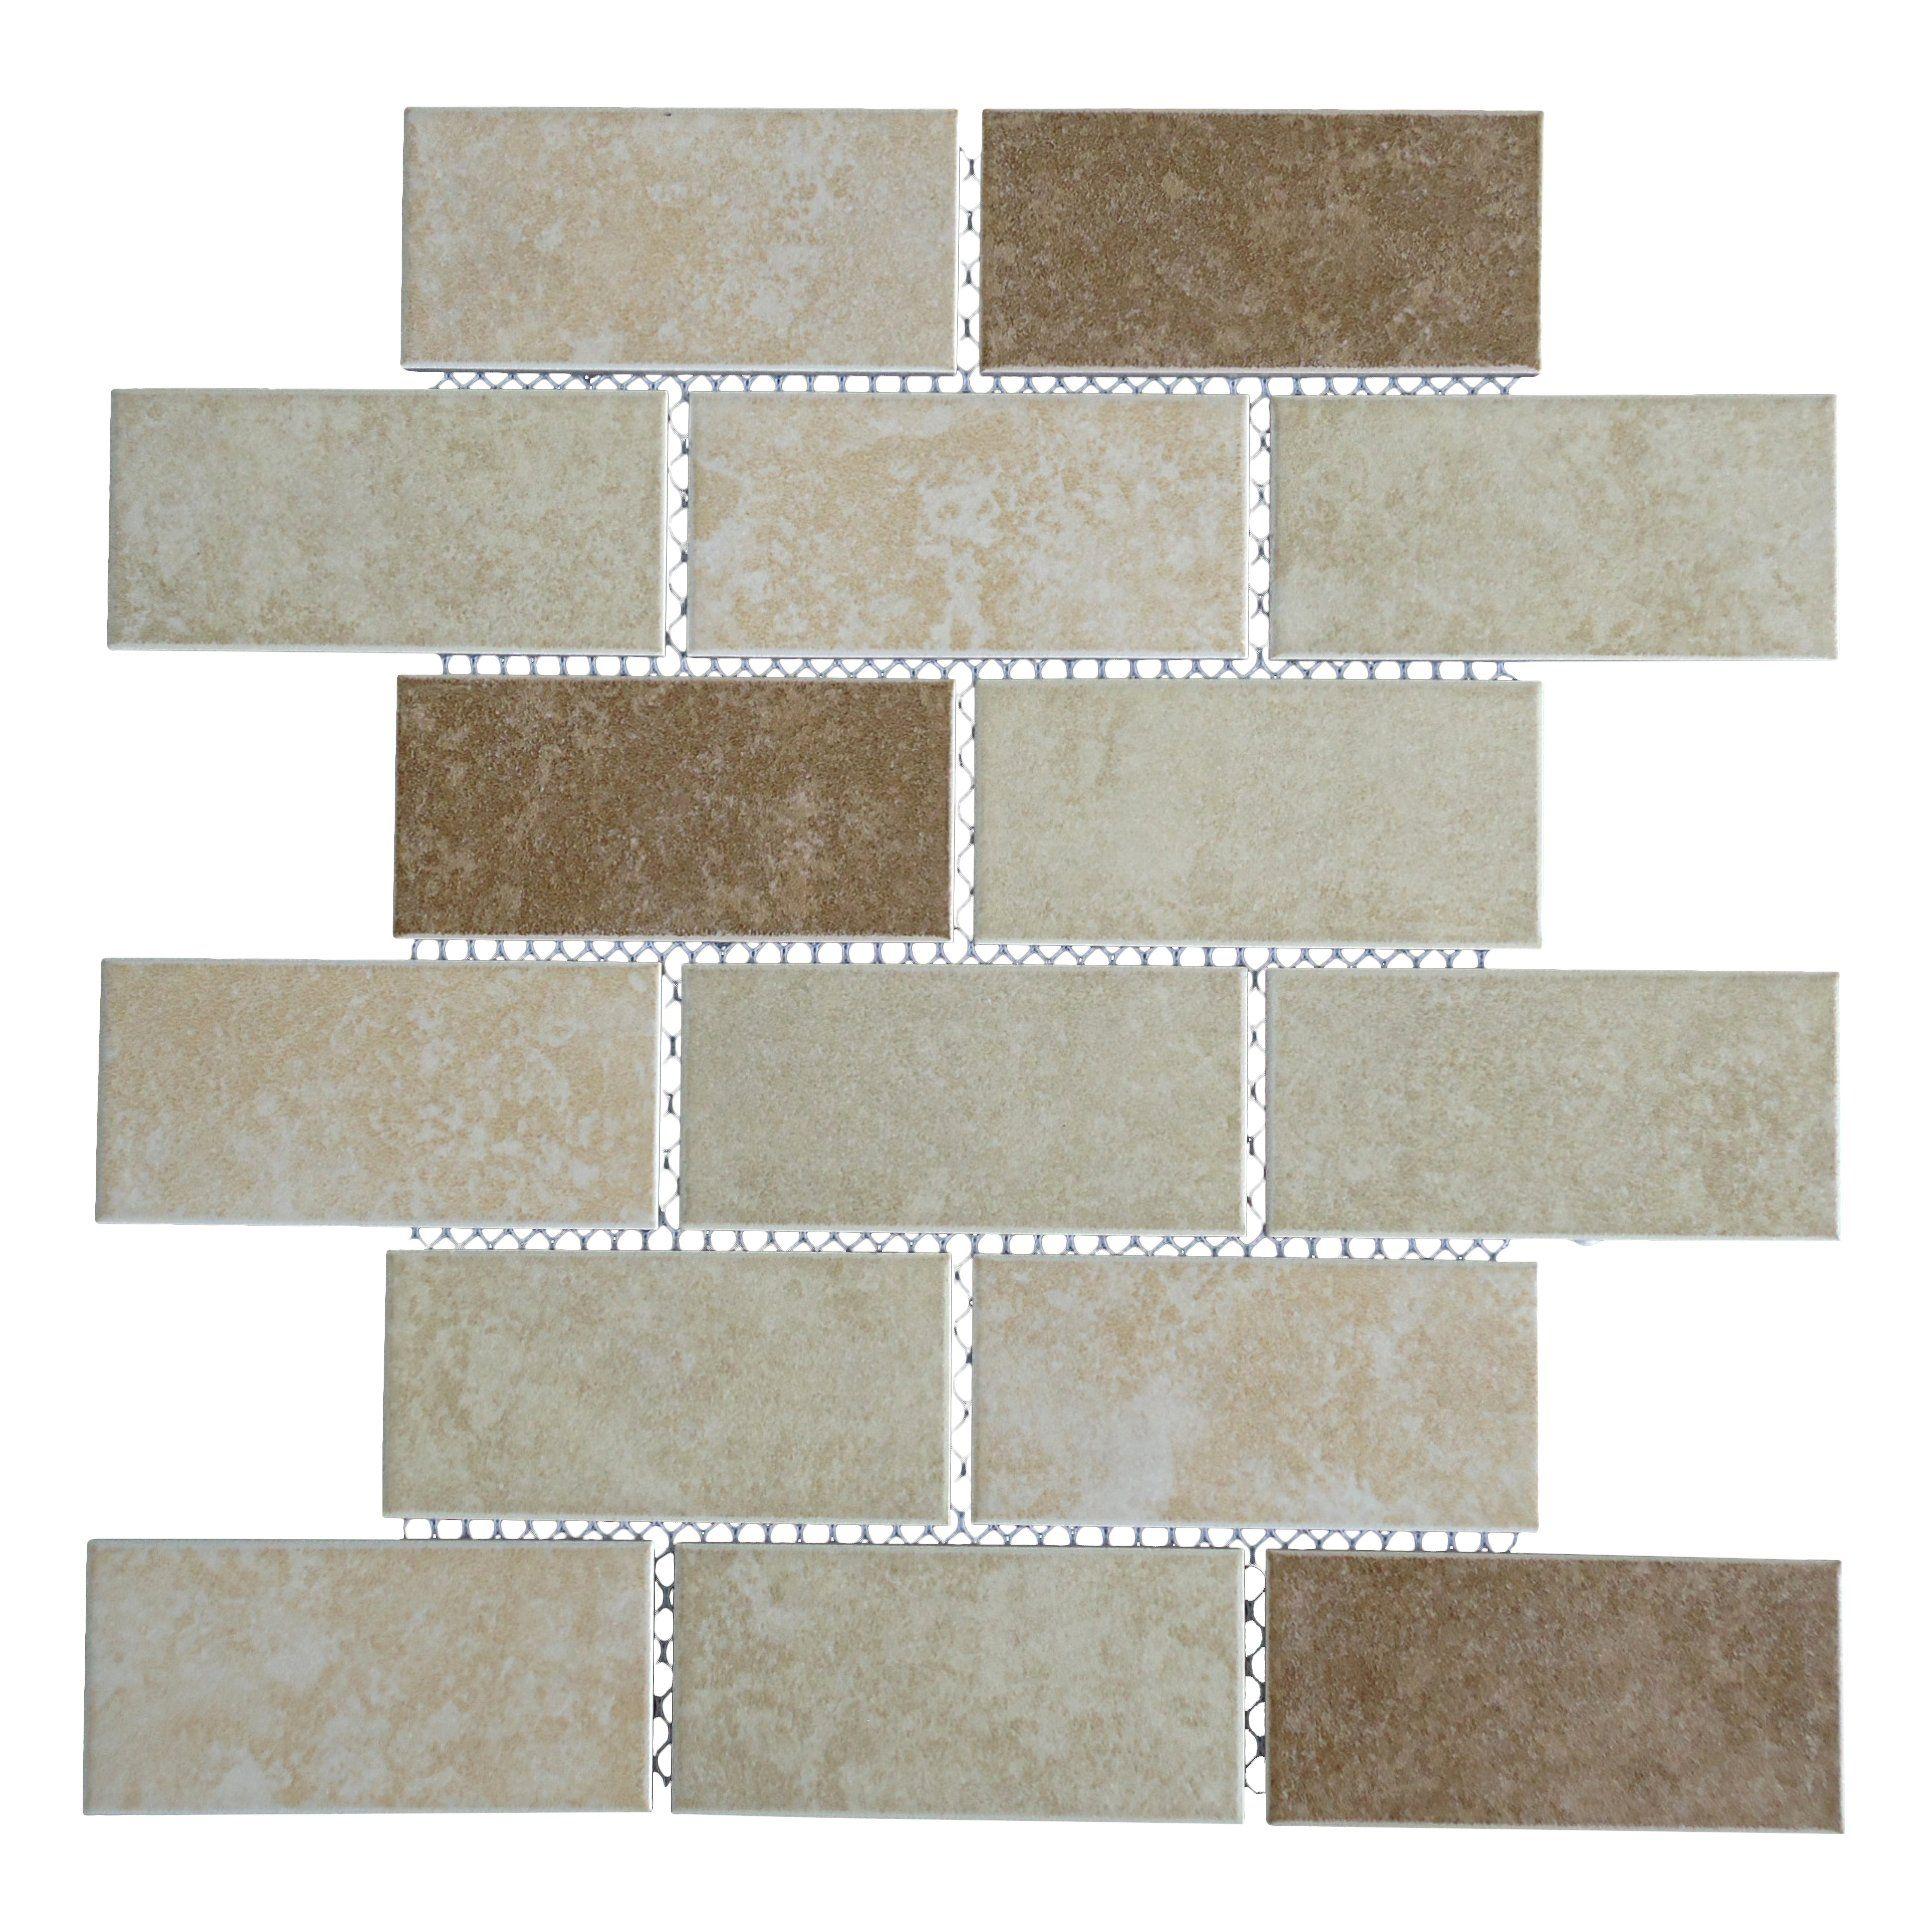 Classique 2 X 4 Porcelain Subway Tile In Beige And Ivory Ideas